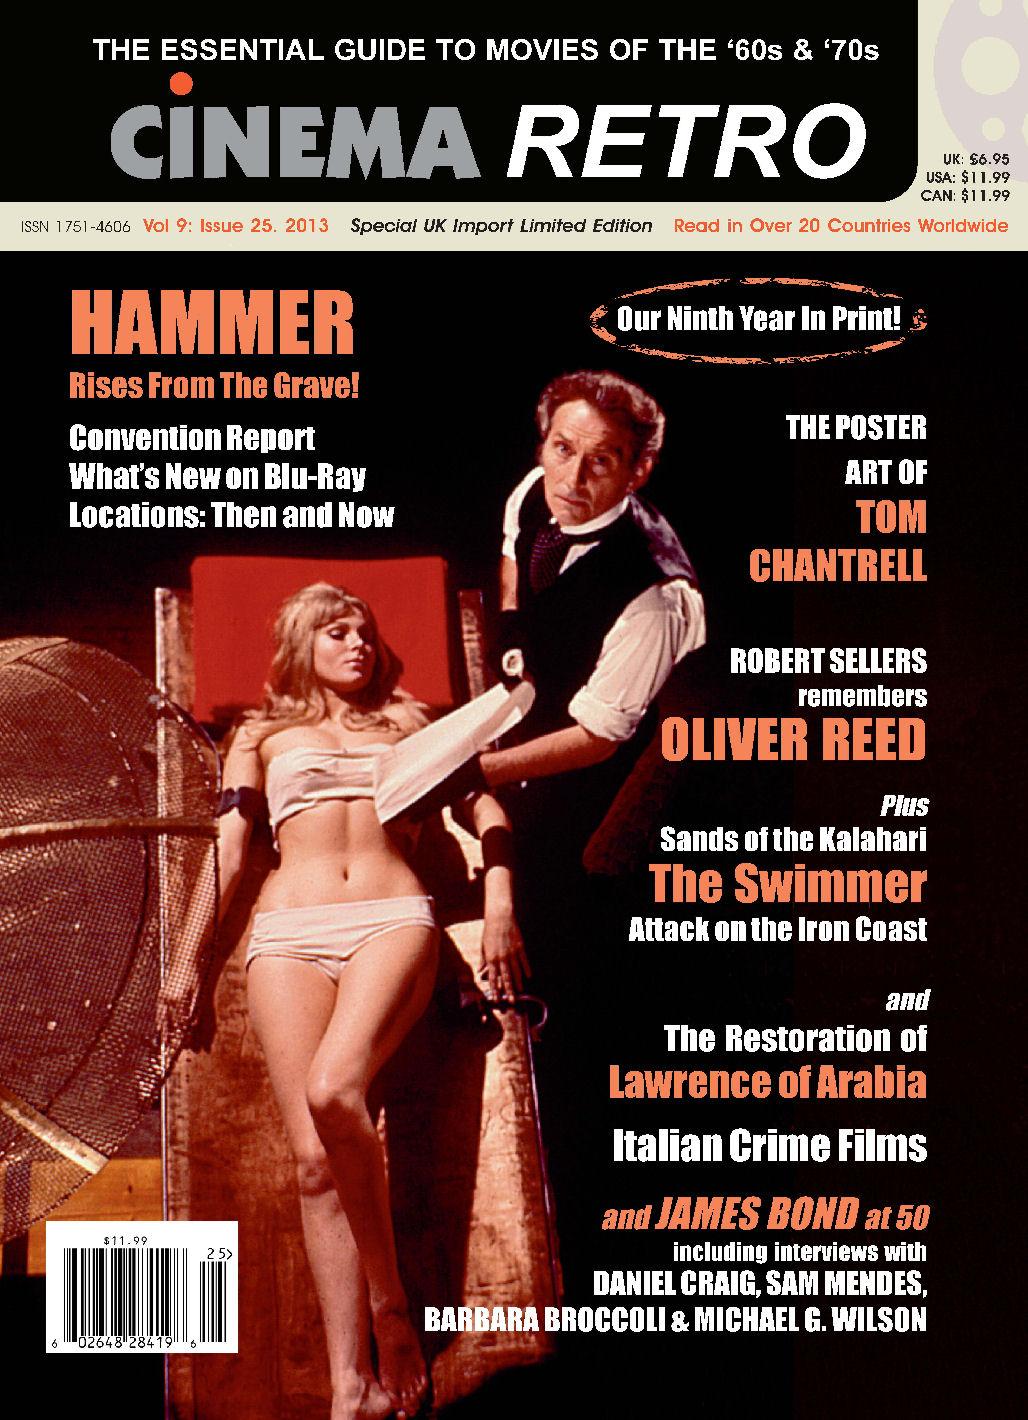 http://2.bp.blogspot.com/-wfRcpPafM_A/ULi4mlaffvI/AAAAAAAAFcE/QBpy7w4t3TE/s1600/CINEMA+RETRO+25+hammer++tom+chantrell.jpg